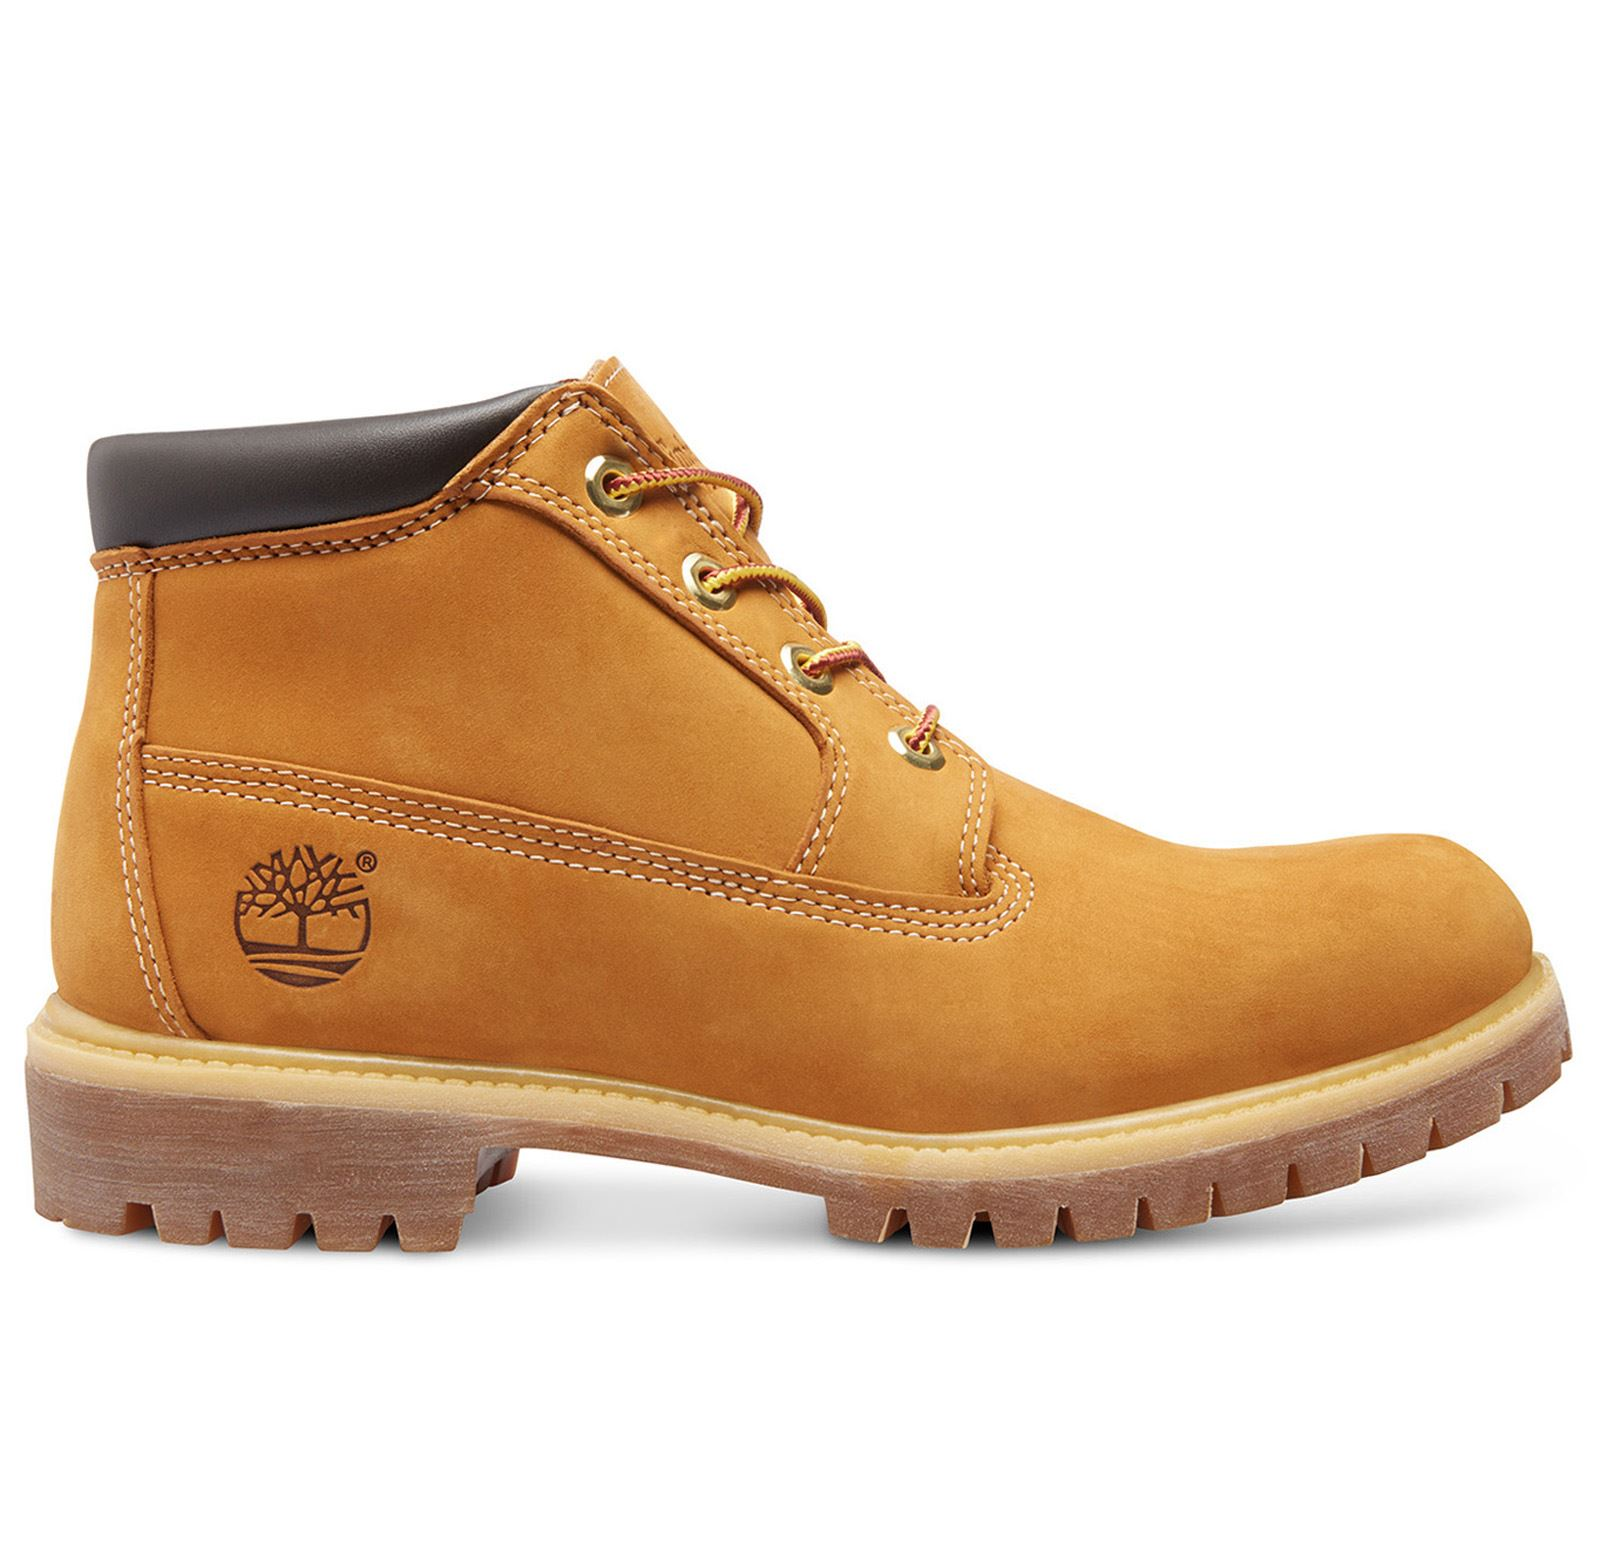 erstklassiger Profi Ruf zuerst heiß seeling original Details about Timberland Icon Heritage Waterproof Chukka Wheat Mens Boots